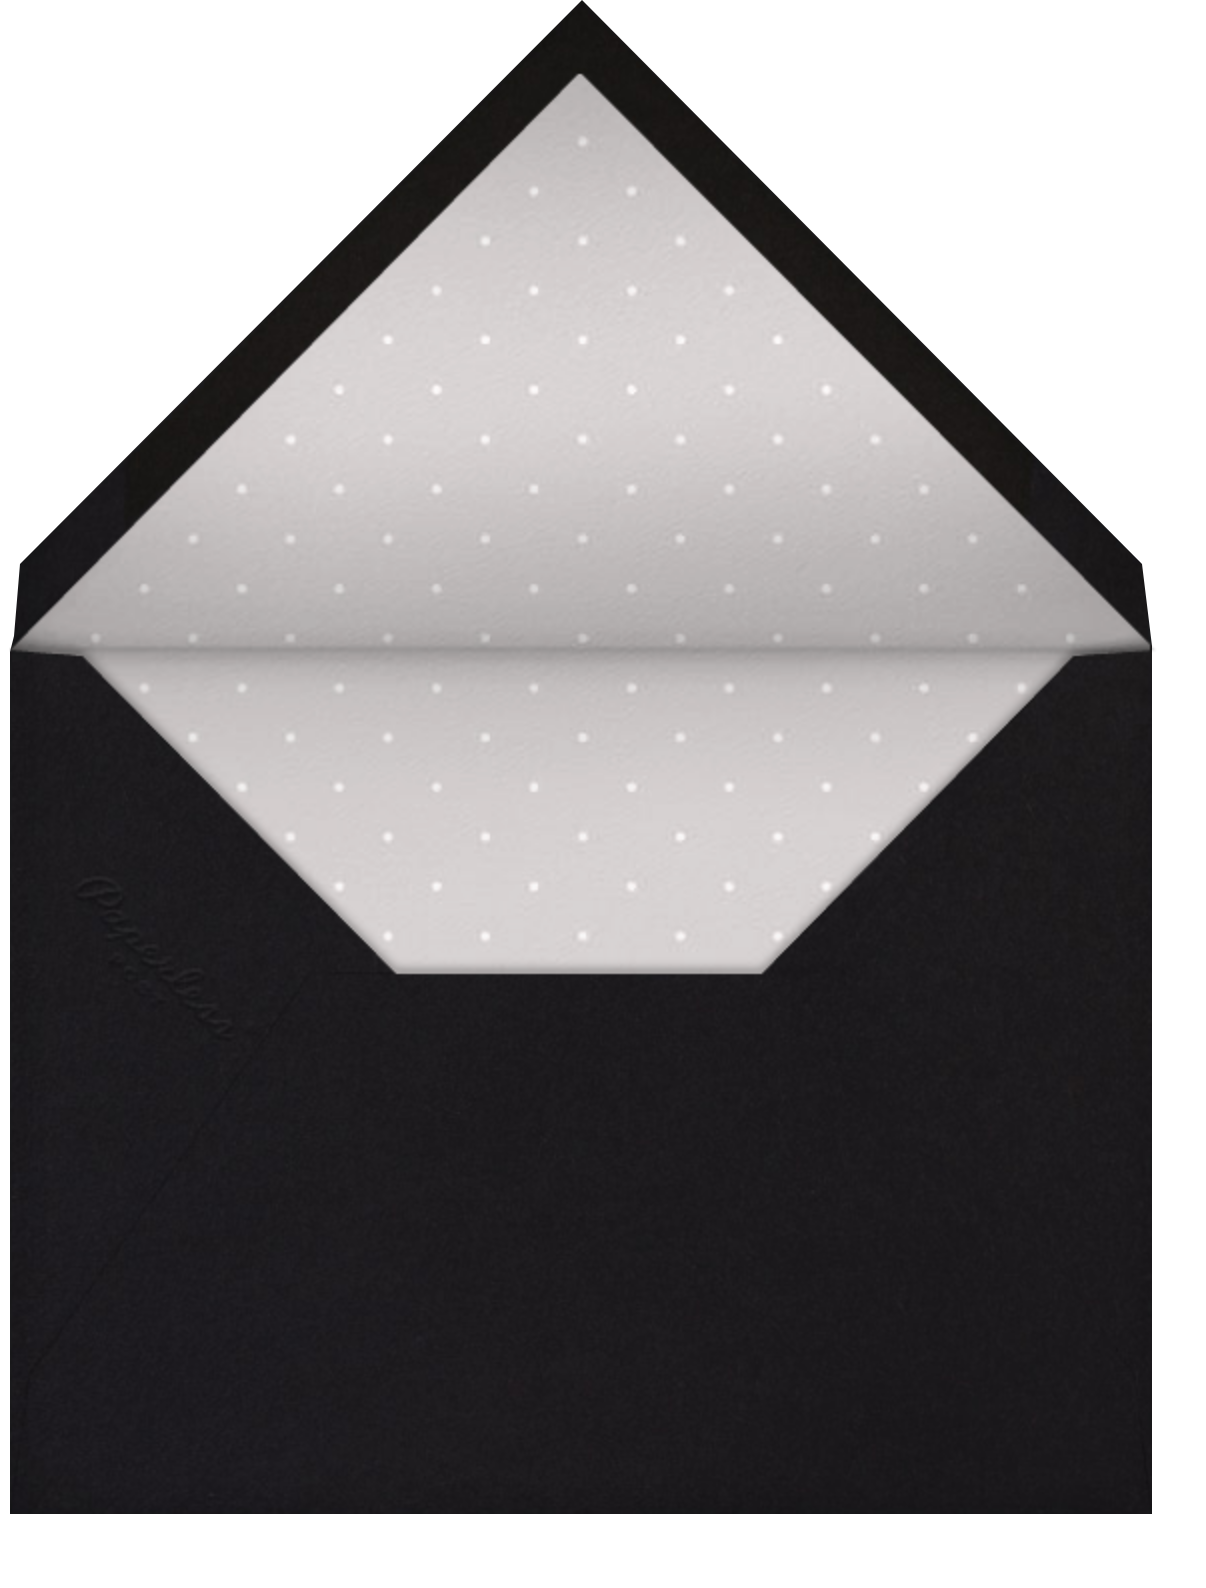 Quad - Black - Paperless Post - Graduation party - envelope back